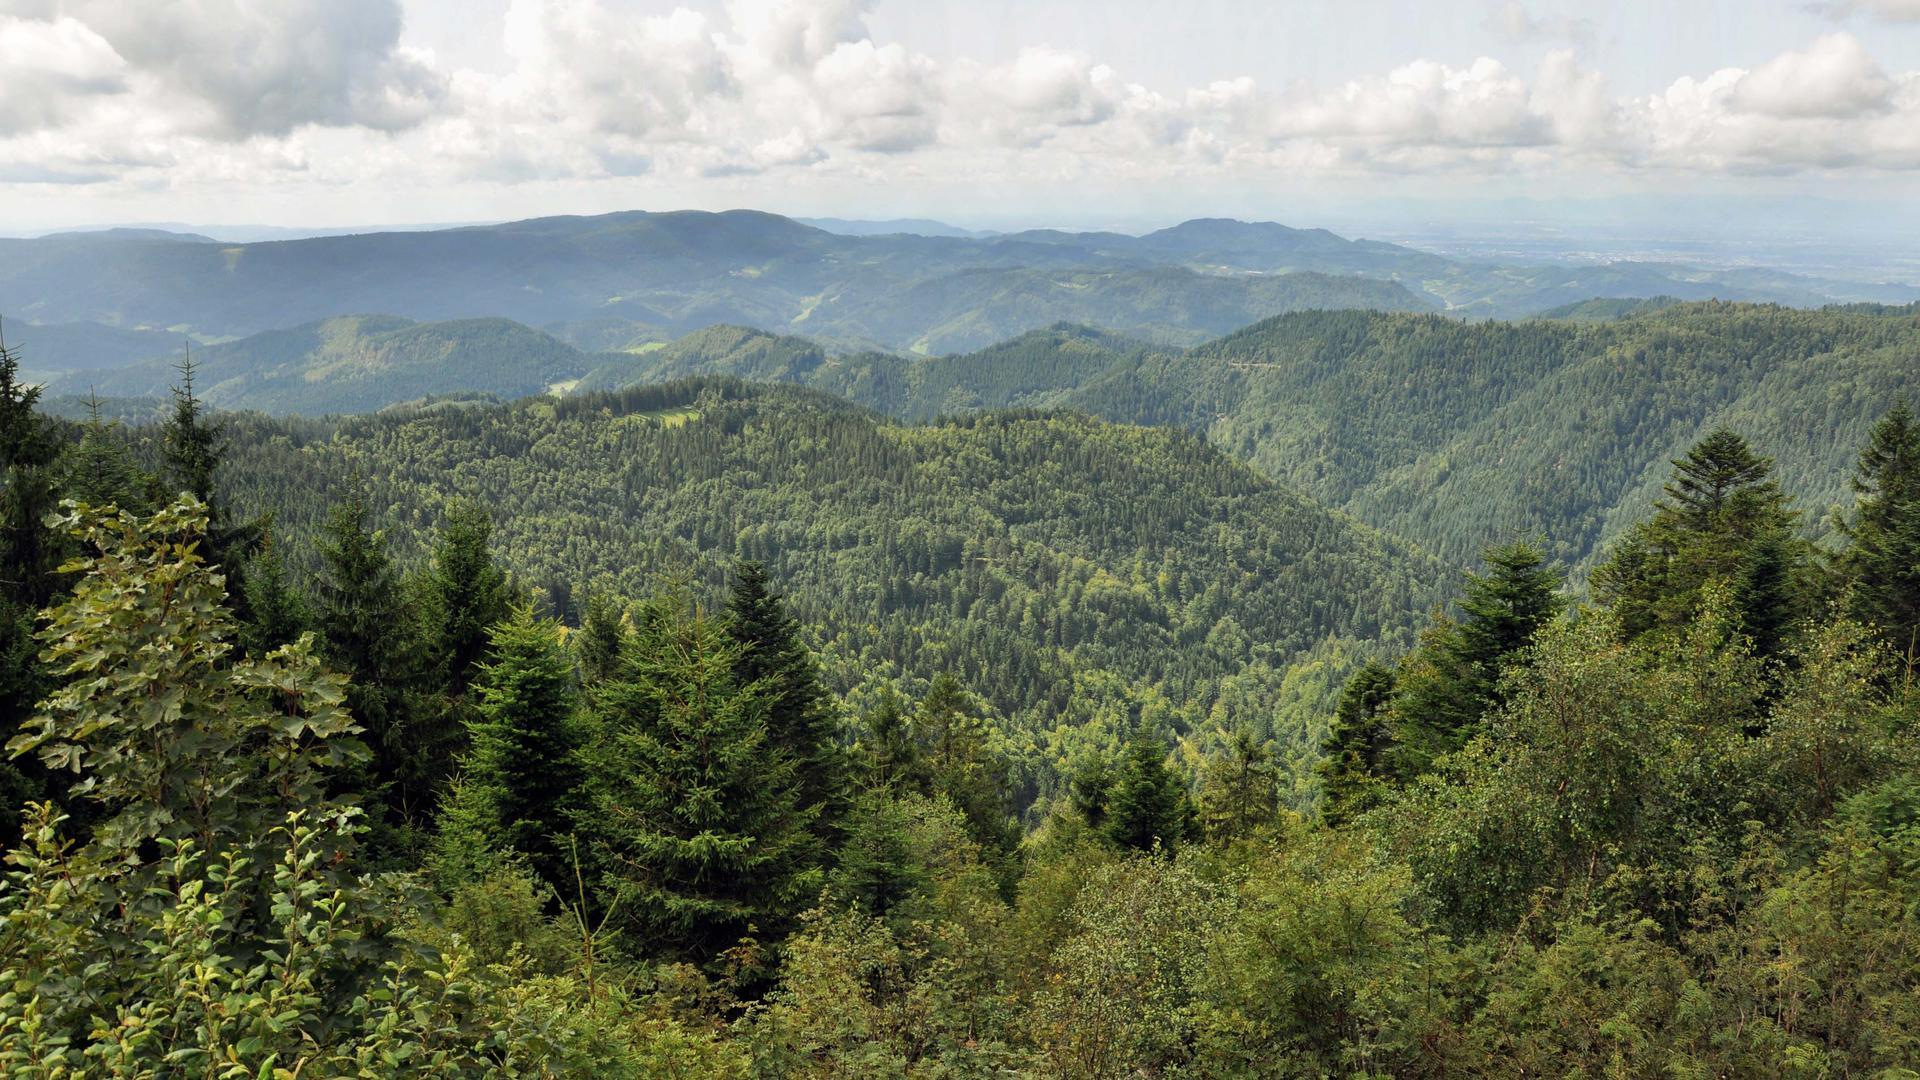 460 Quadratkilometer kommen neu zum Naturpark Schwarzwald Mitte/Nord hinzu.